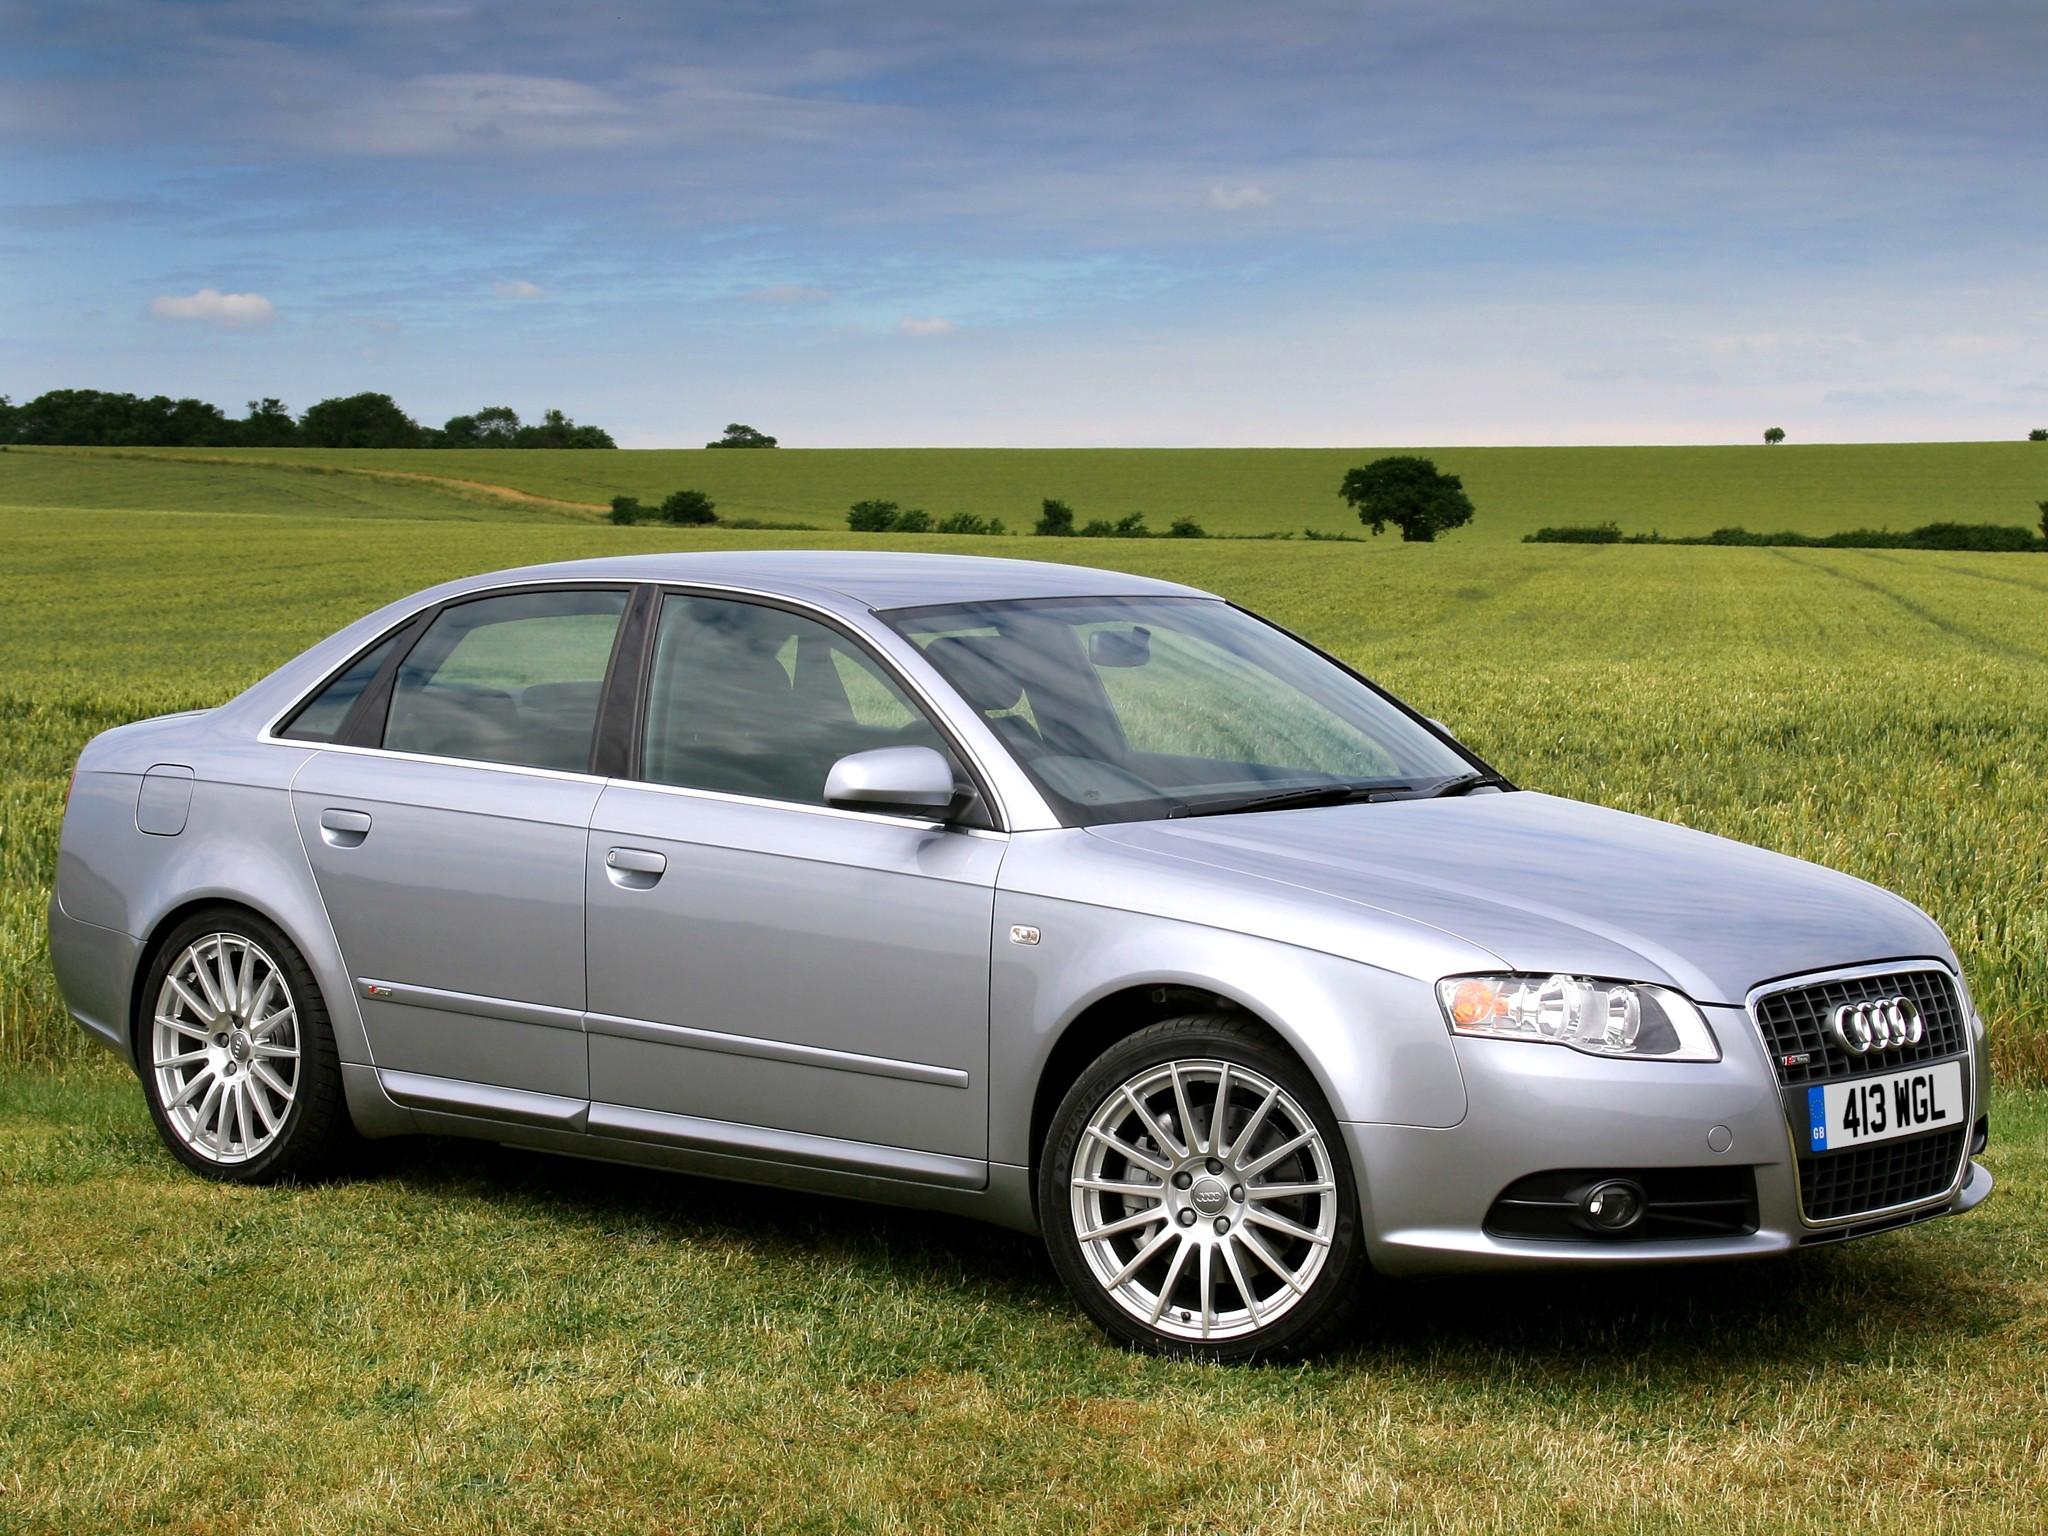 audi a4 2004 2007 line b7 sedan 0t spec 8e 2006 specs autoevolution 2005 1536 2048